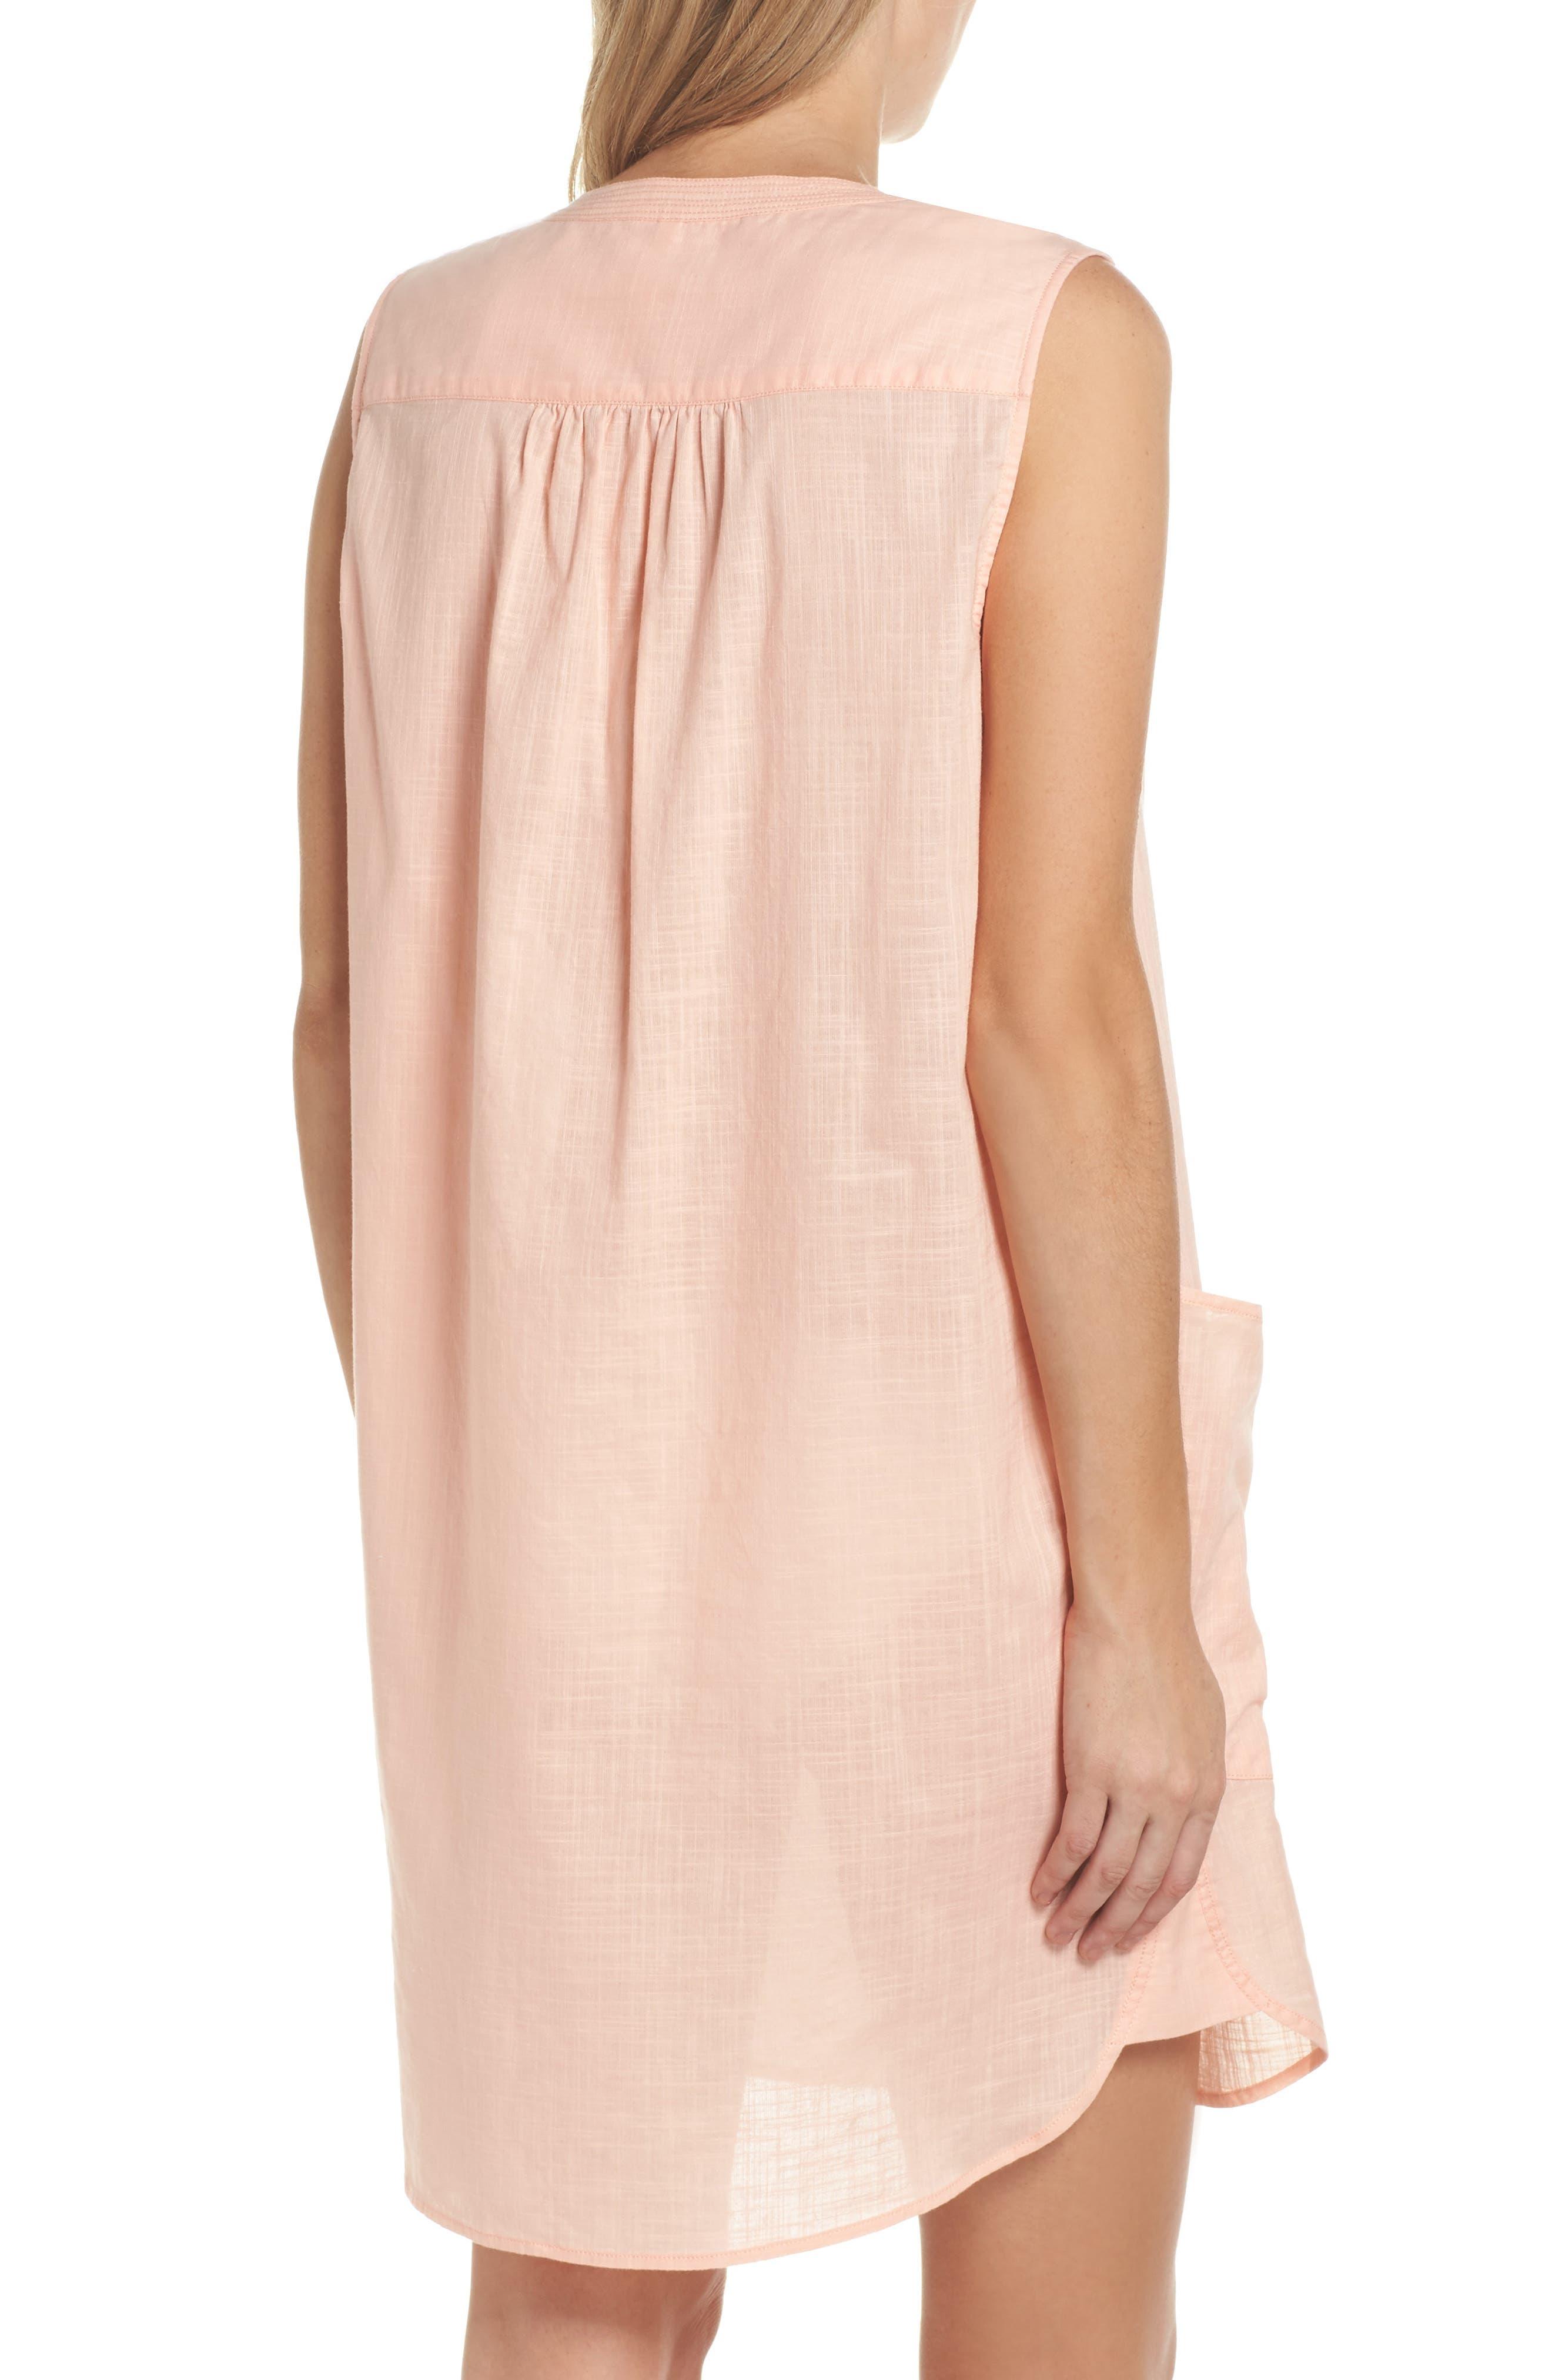 Palm Beach Cover-Up Dress,                             Alternate thumbnail 2, color,                             Peach Melba